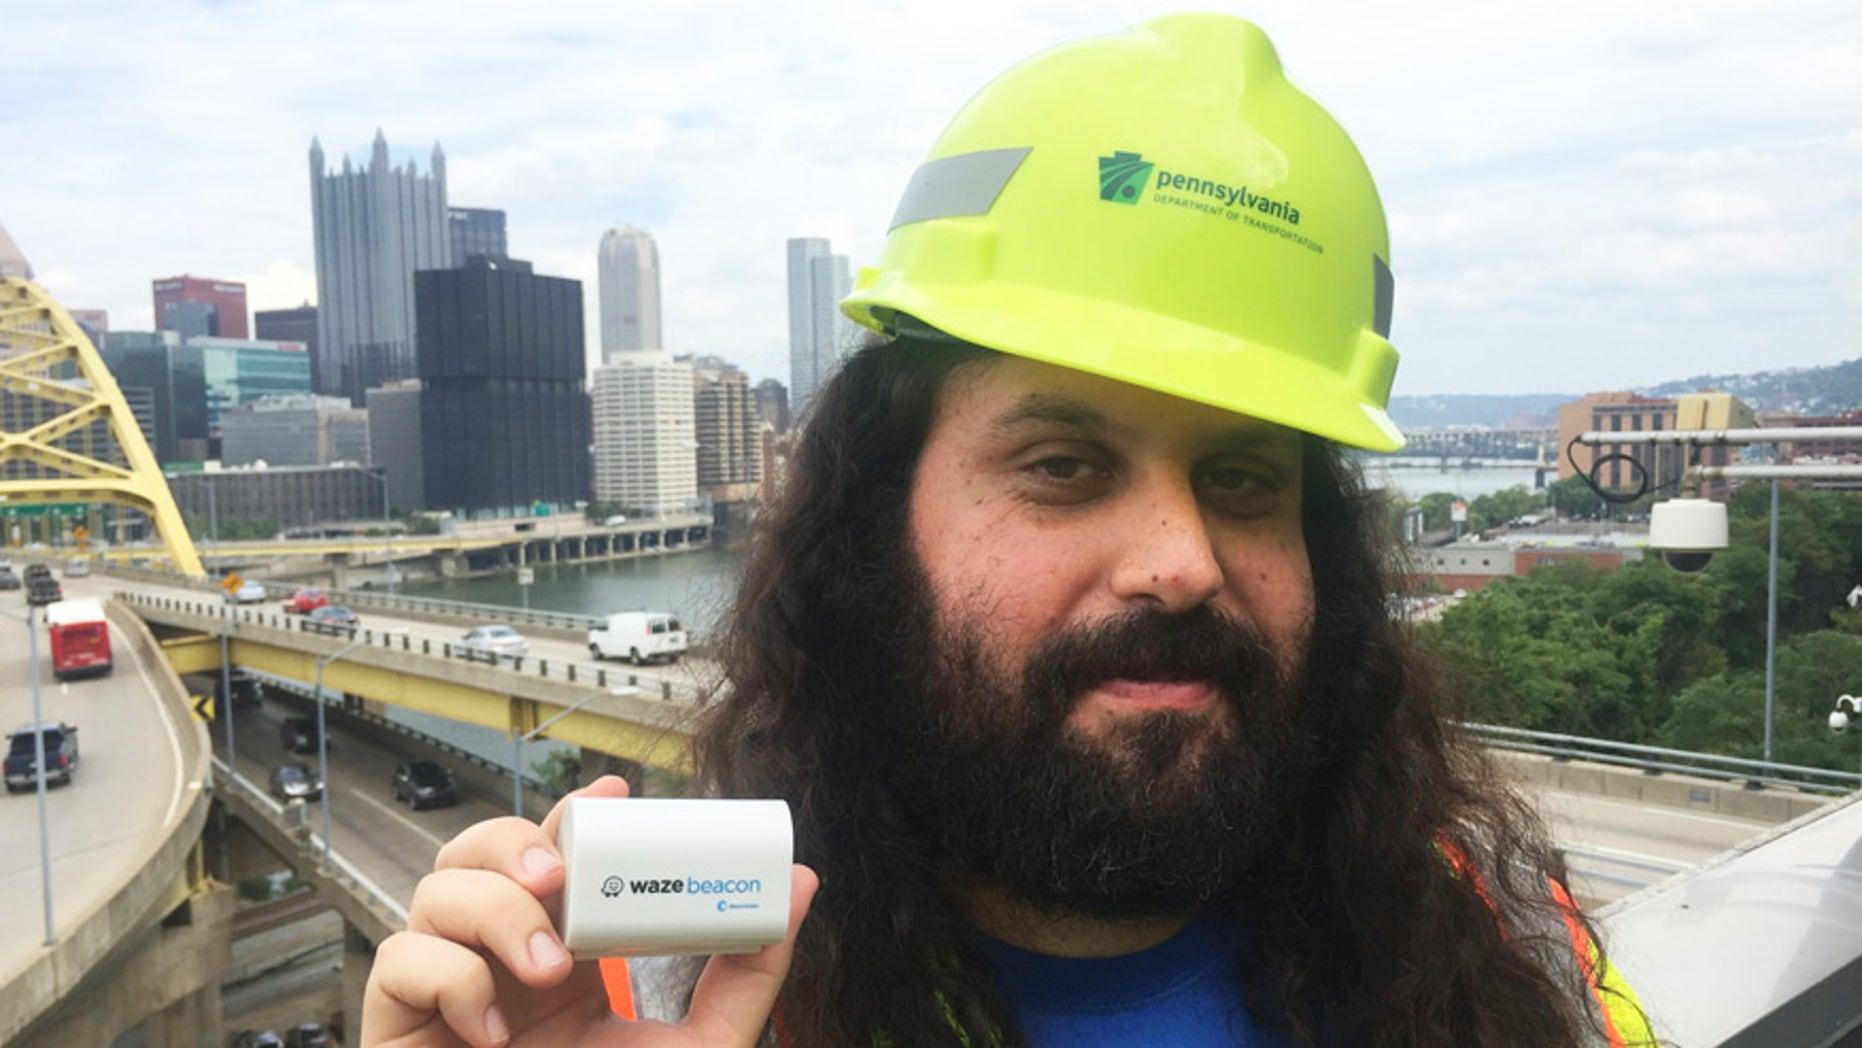 Waze system operation engineer Gil Disatnik holds a Waze beacon in Pittsburgh.